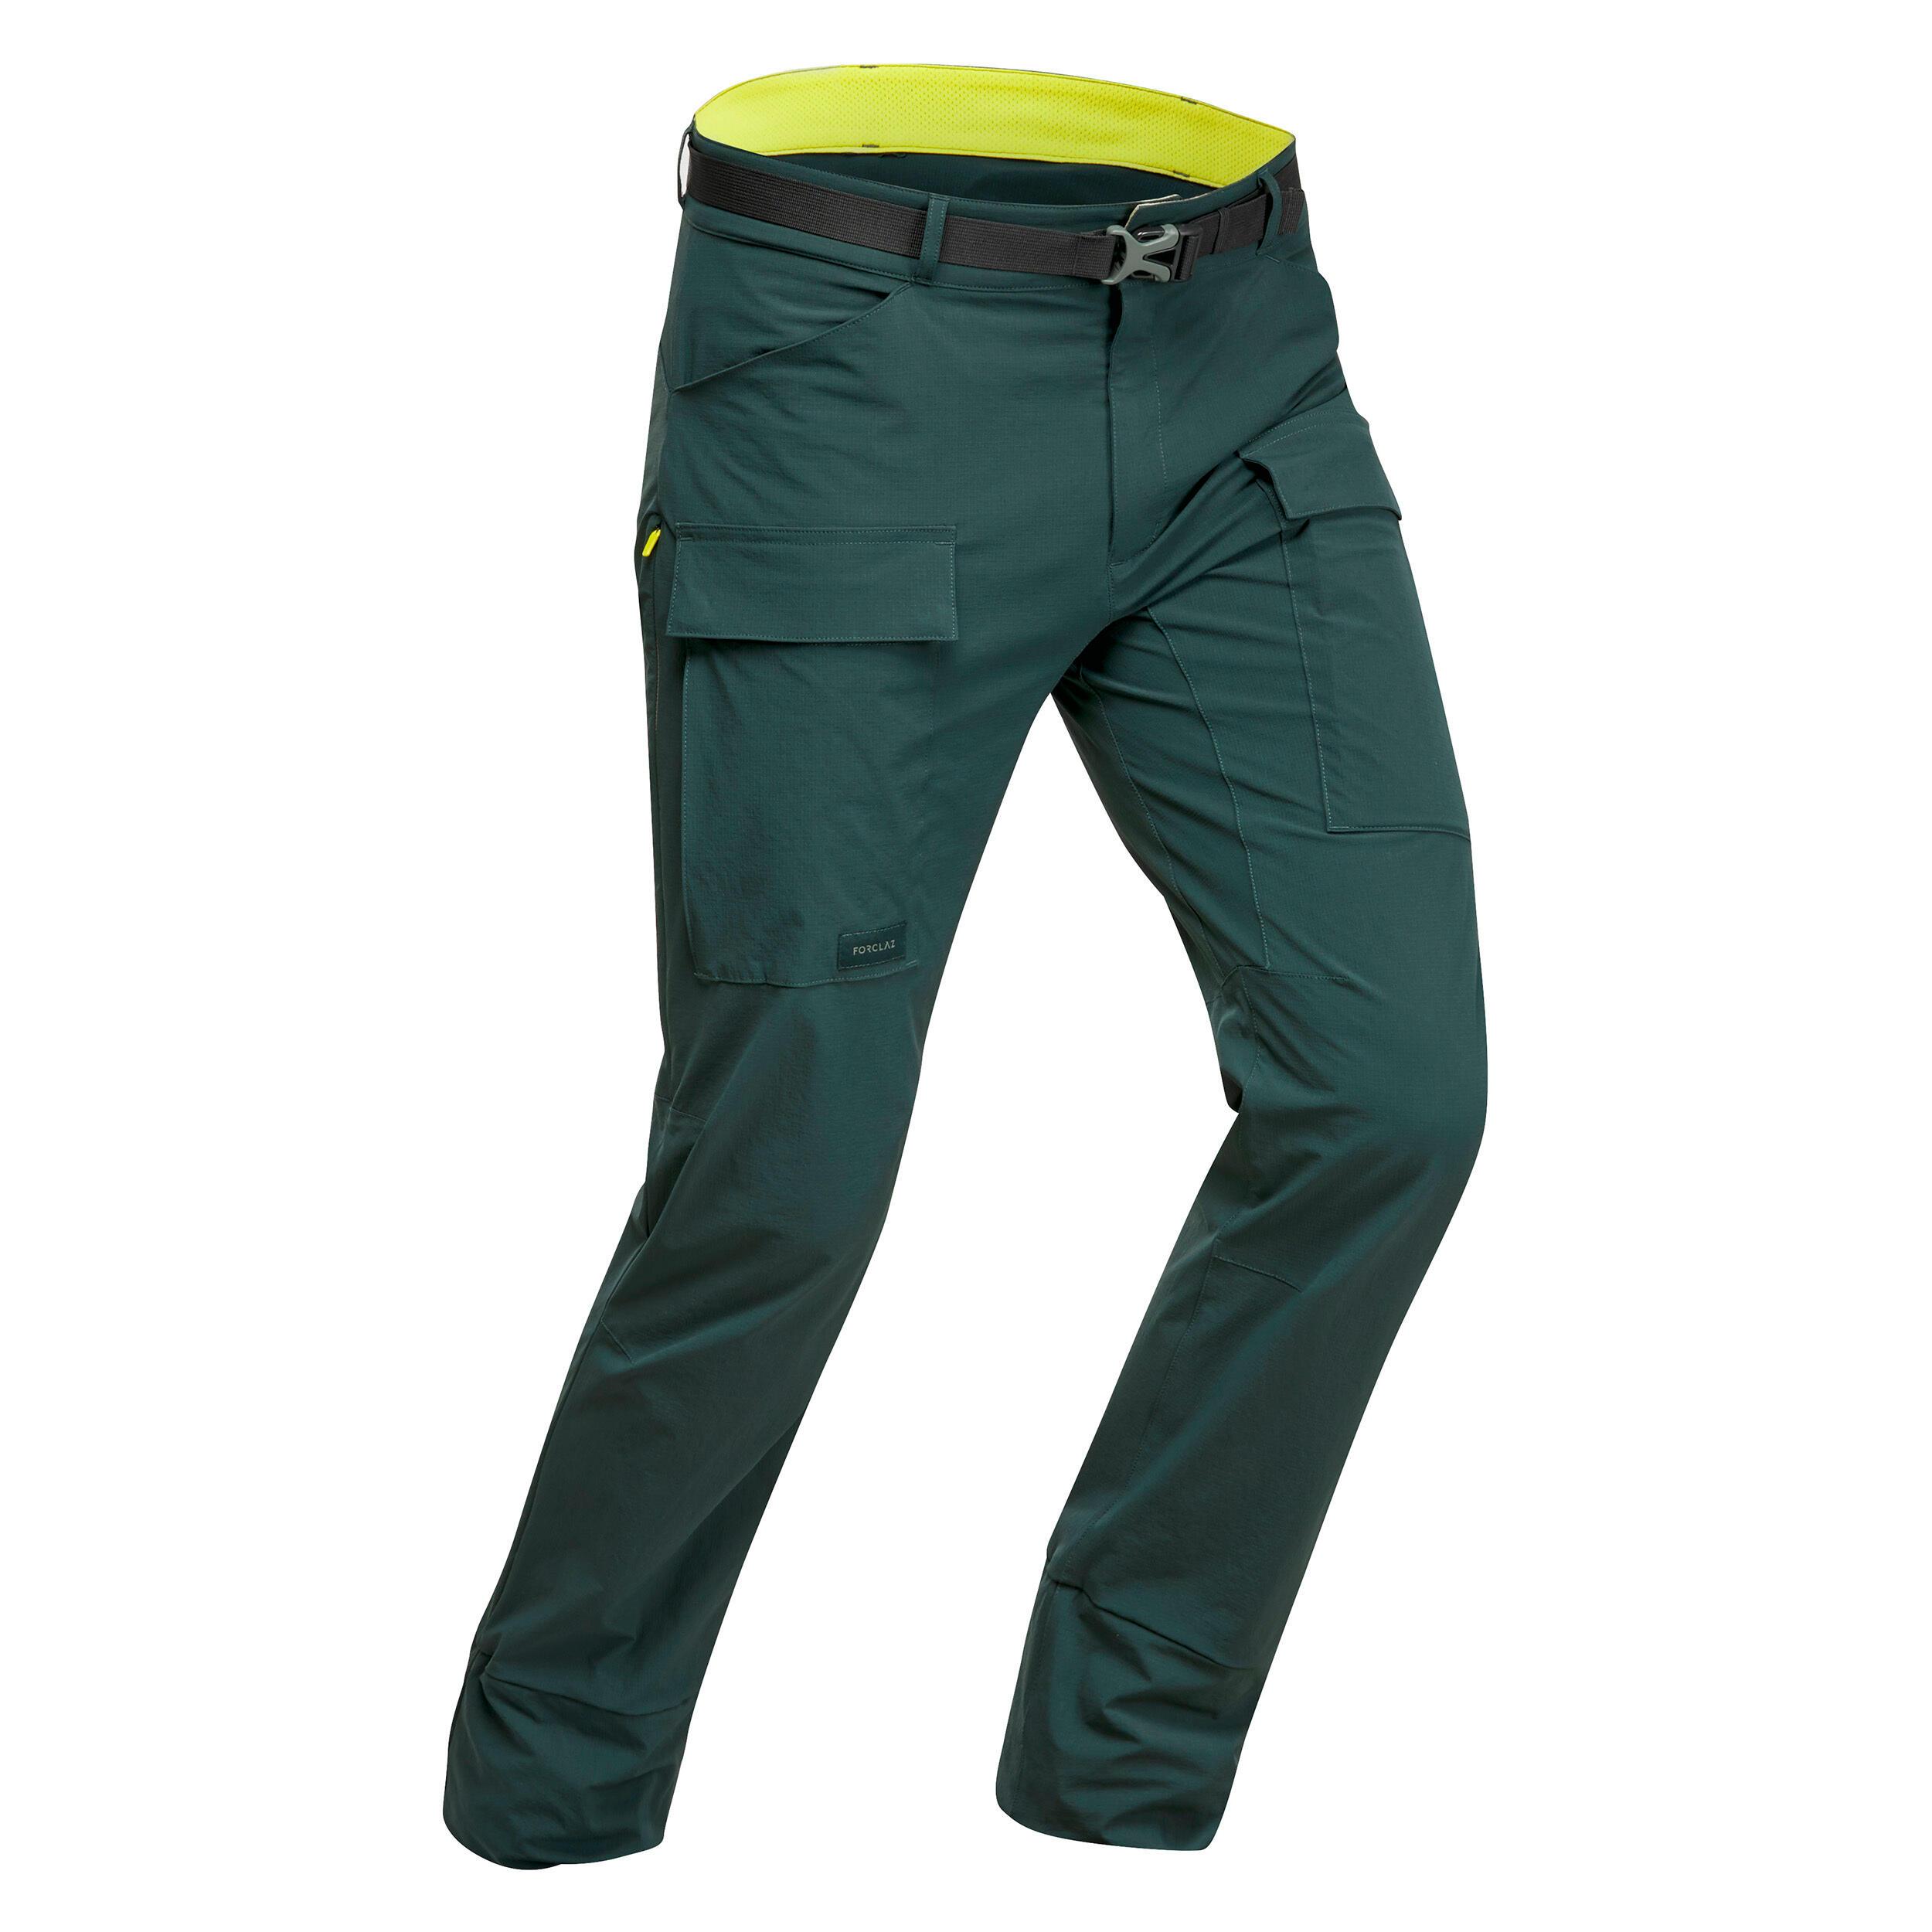 Pantalon TROPIC500 Bărbați imagine